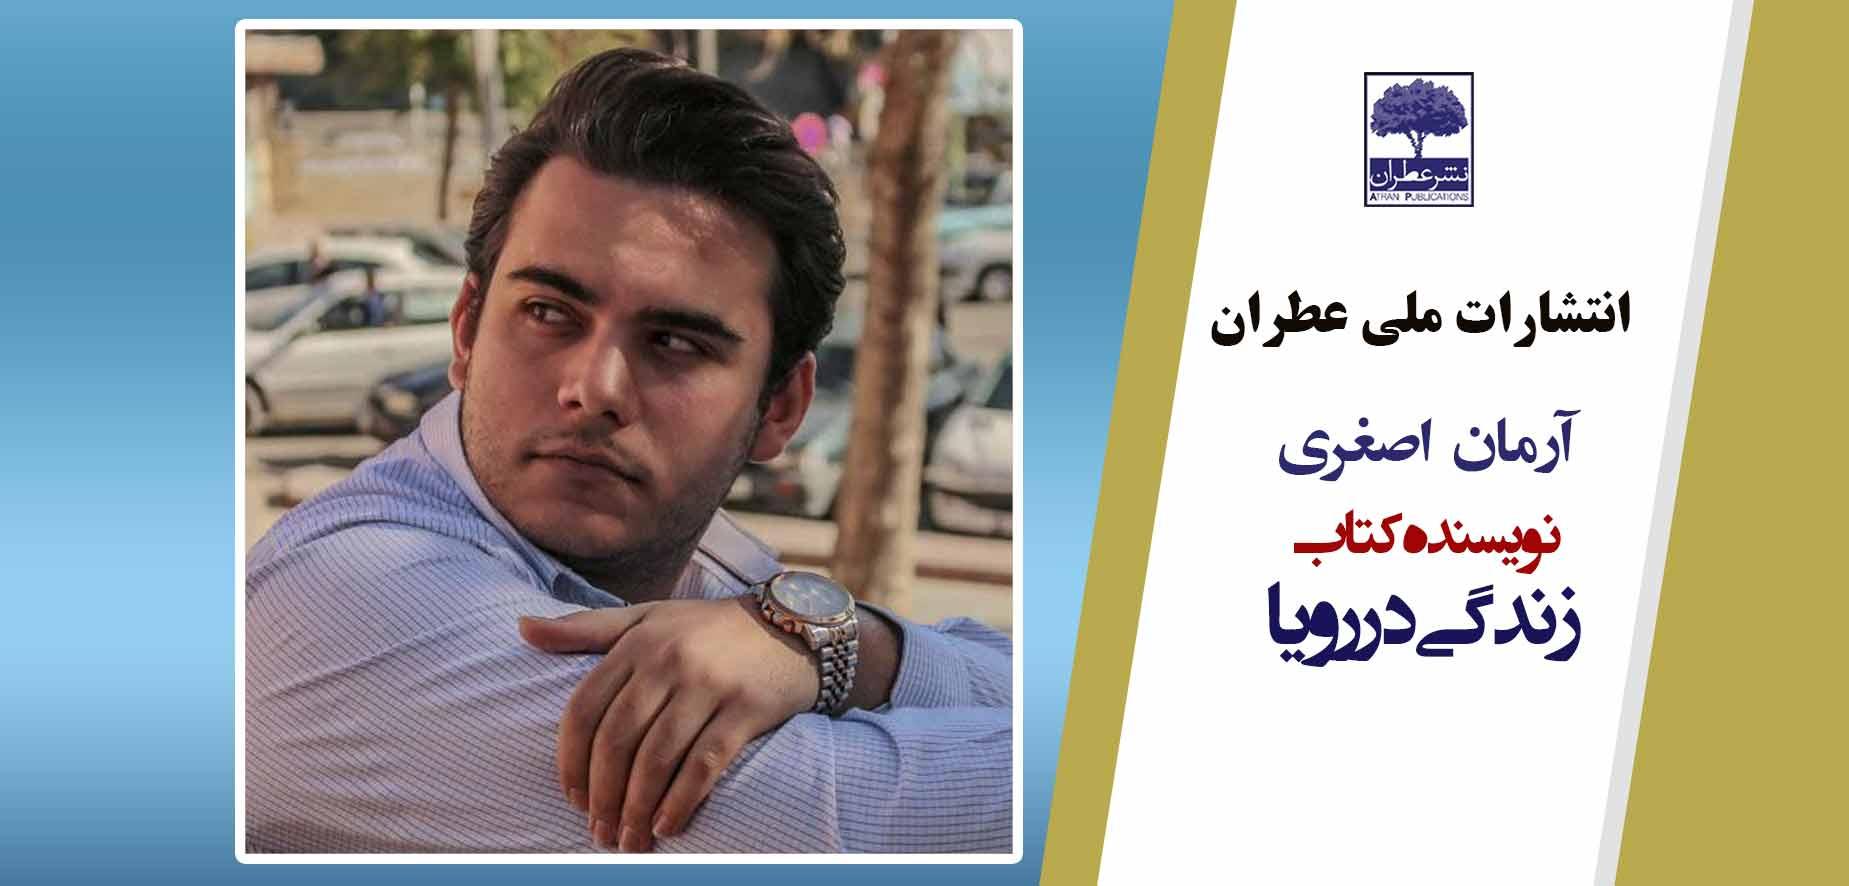 آرمان اصغری: نویسنده کتاب